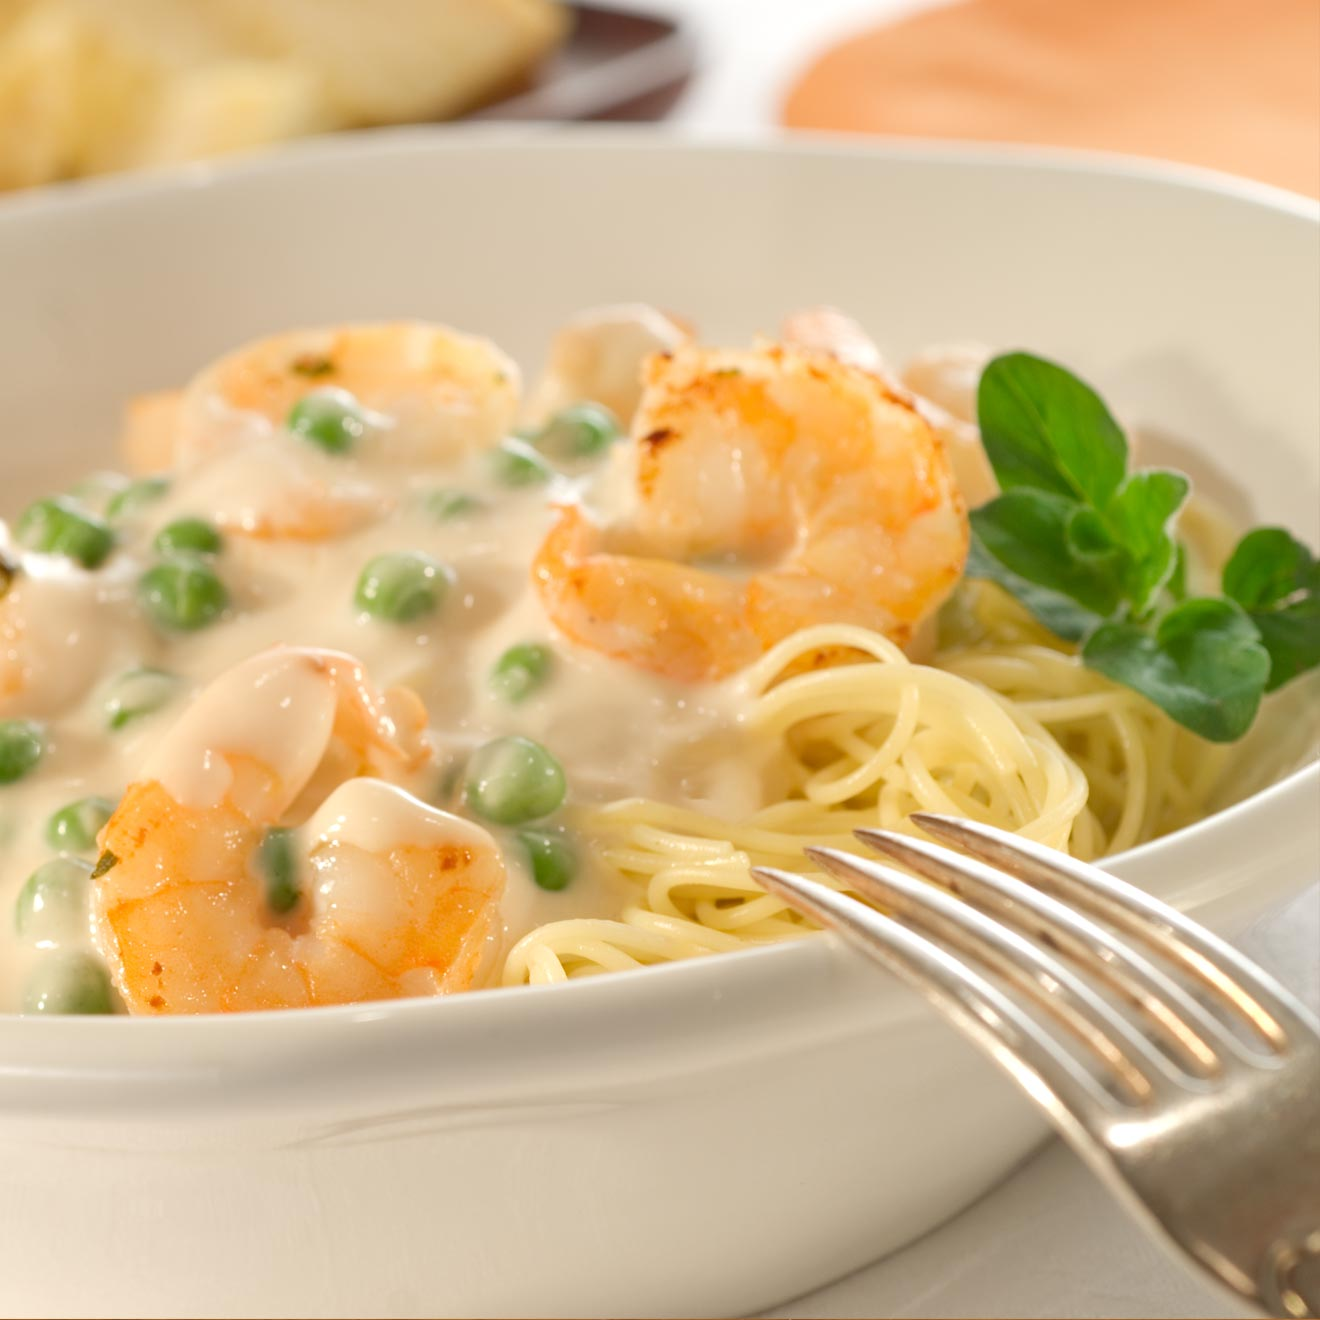 Bertolli Alfredo Sauce Recipes With Shrimp Blog Dandk